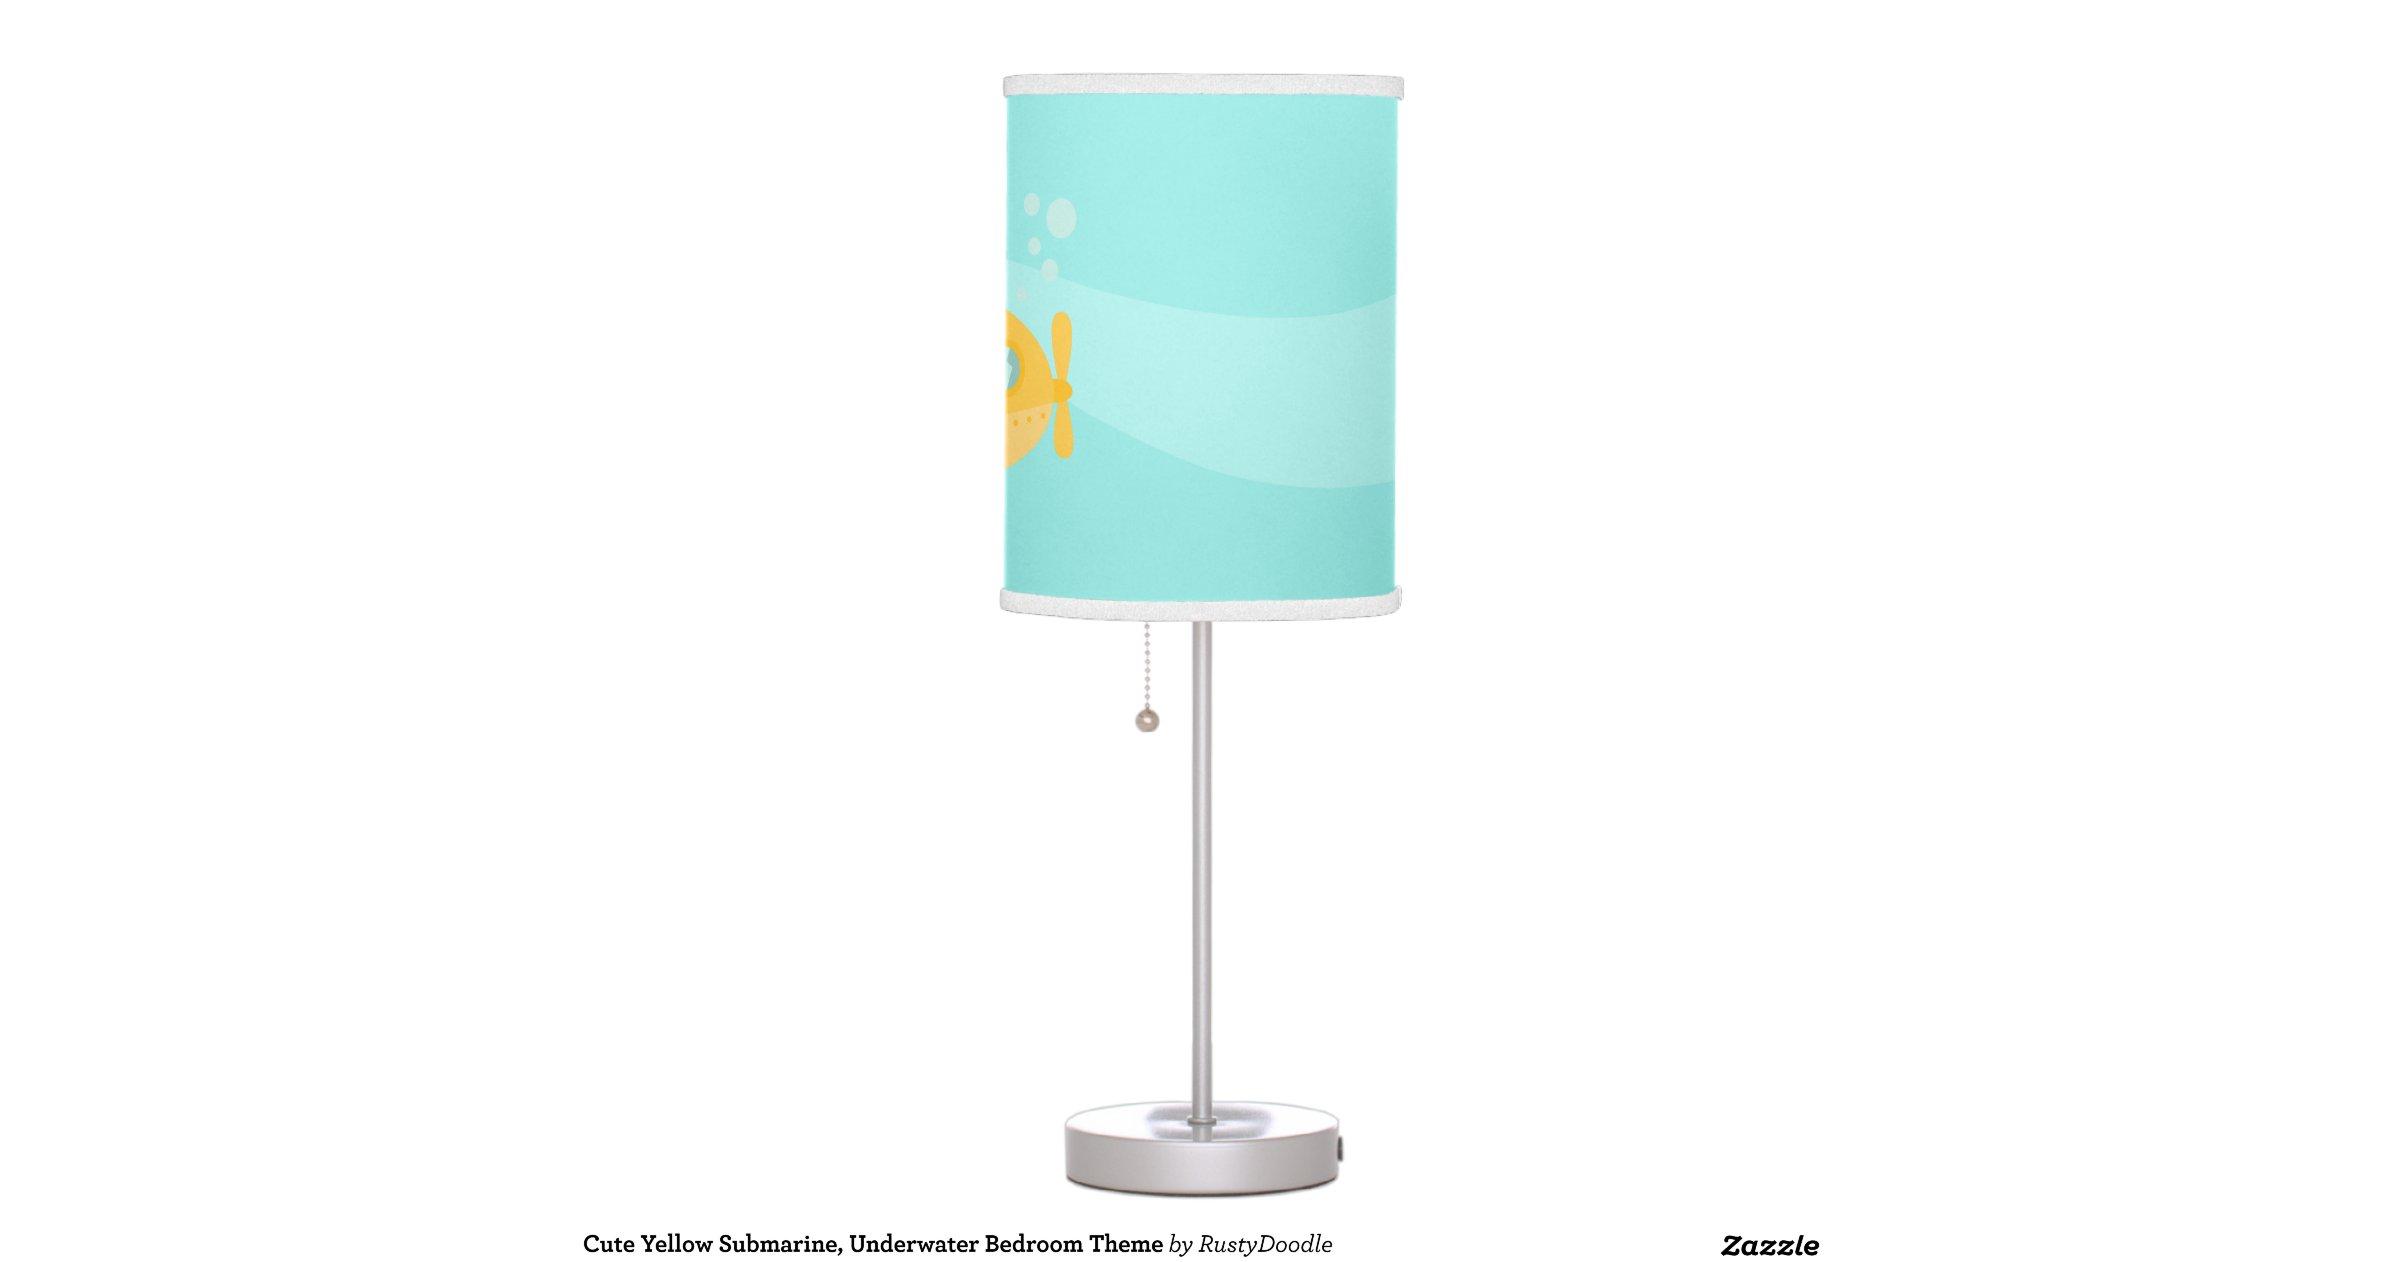 Cute Yellow Submarine Underwater Bedroom Theme Table